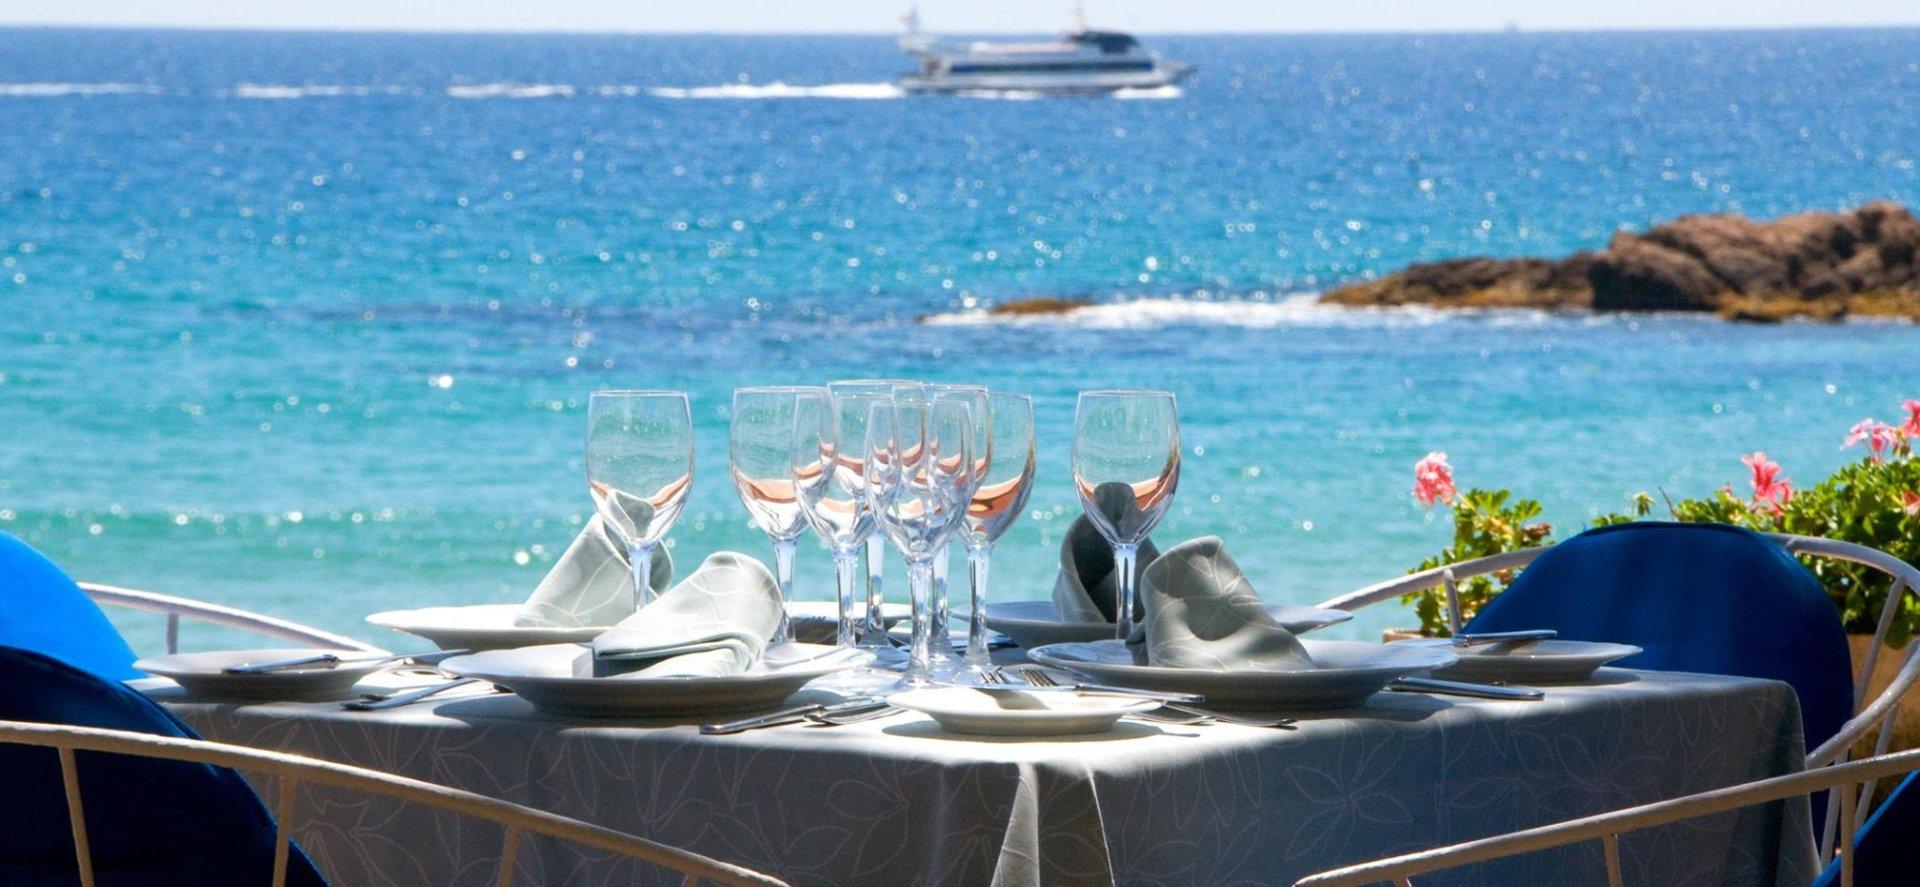 Dónde comer en Lloret de Mar